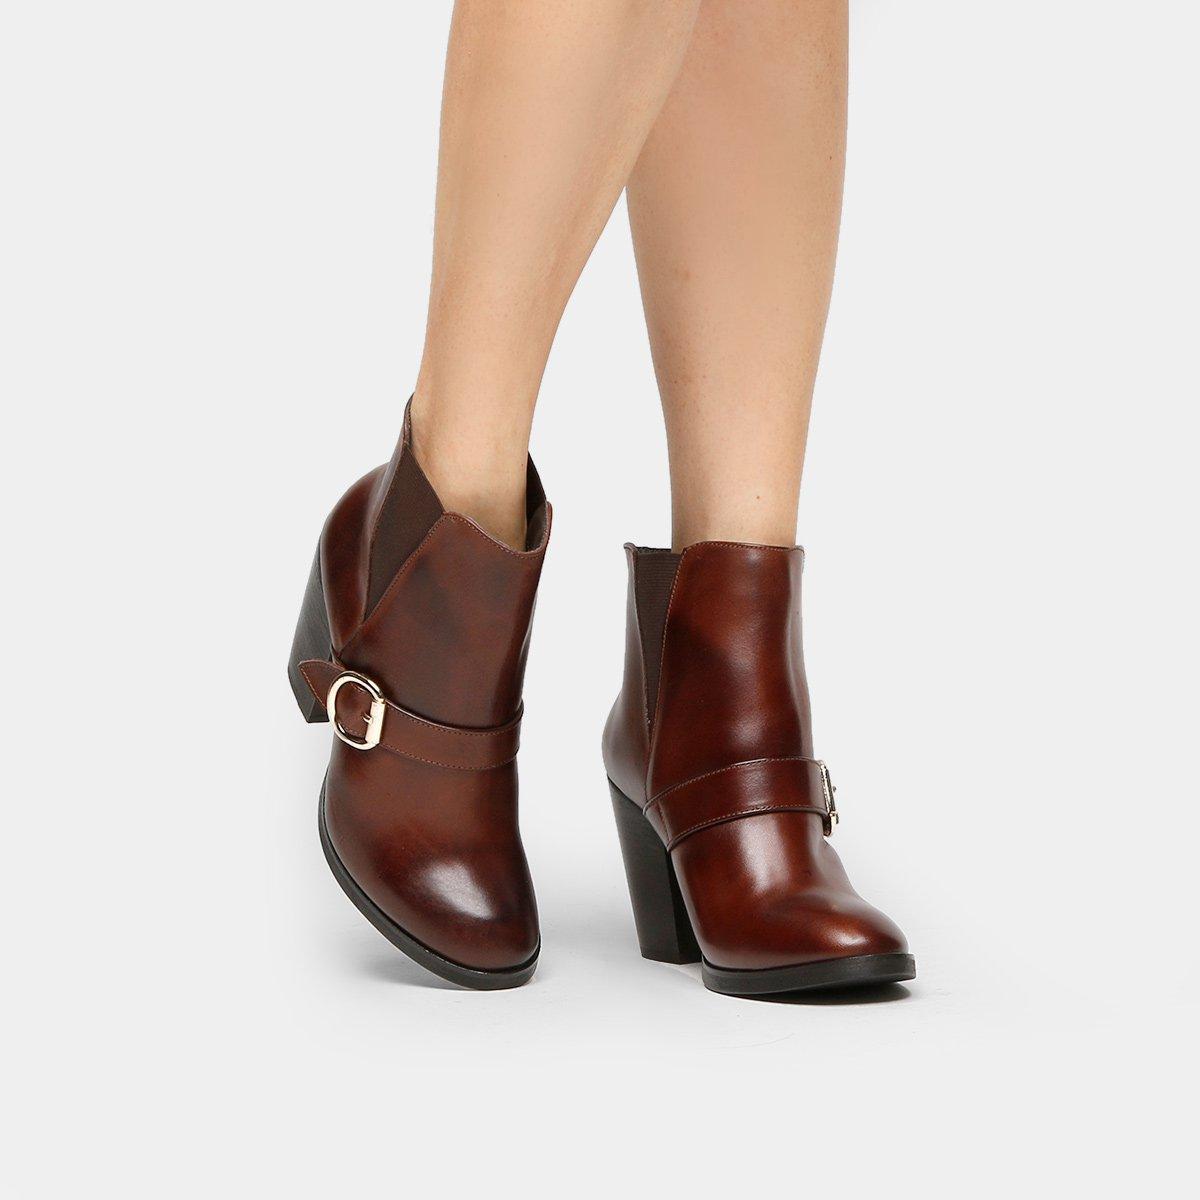 3a9781c37 Bota Couro Cano Curto Shoestock Fivela Feminina